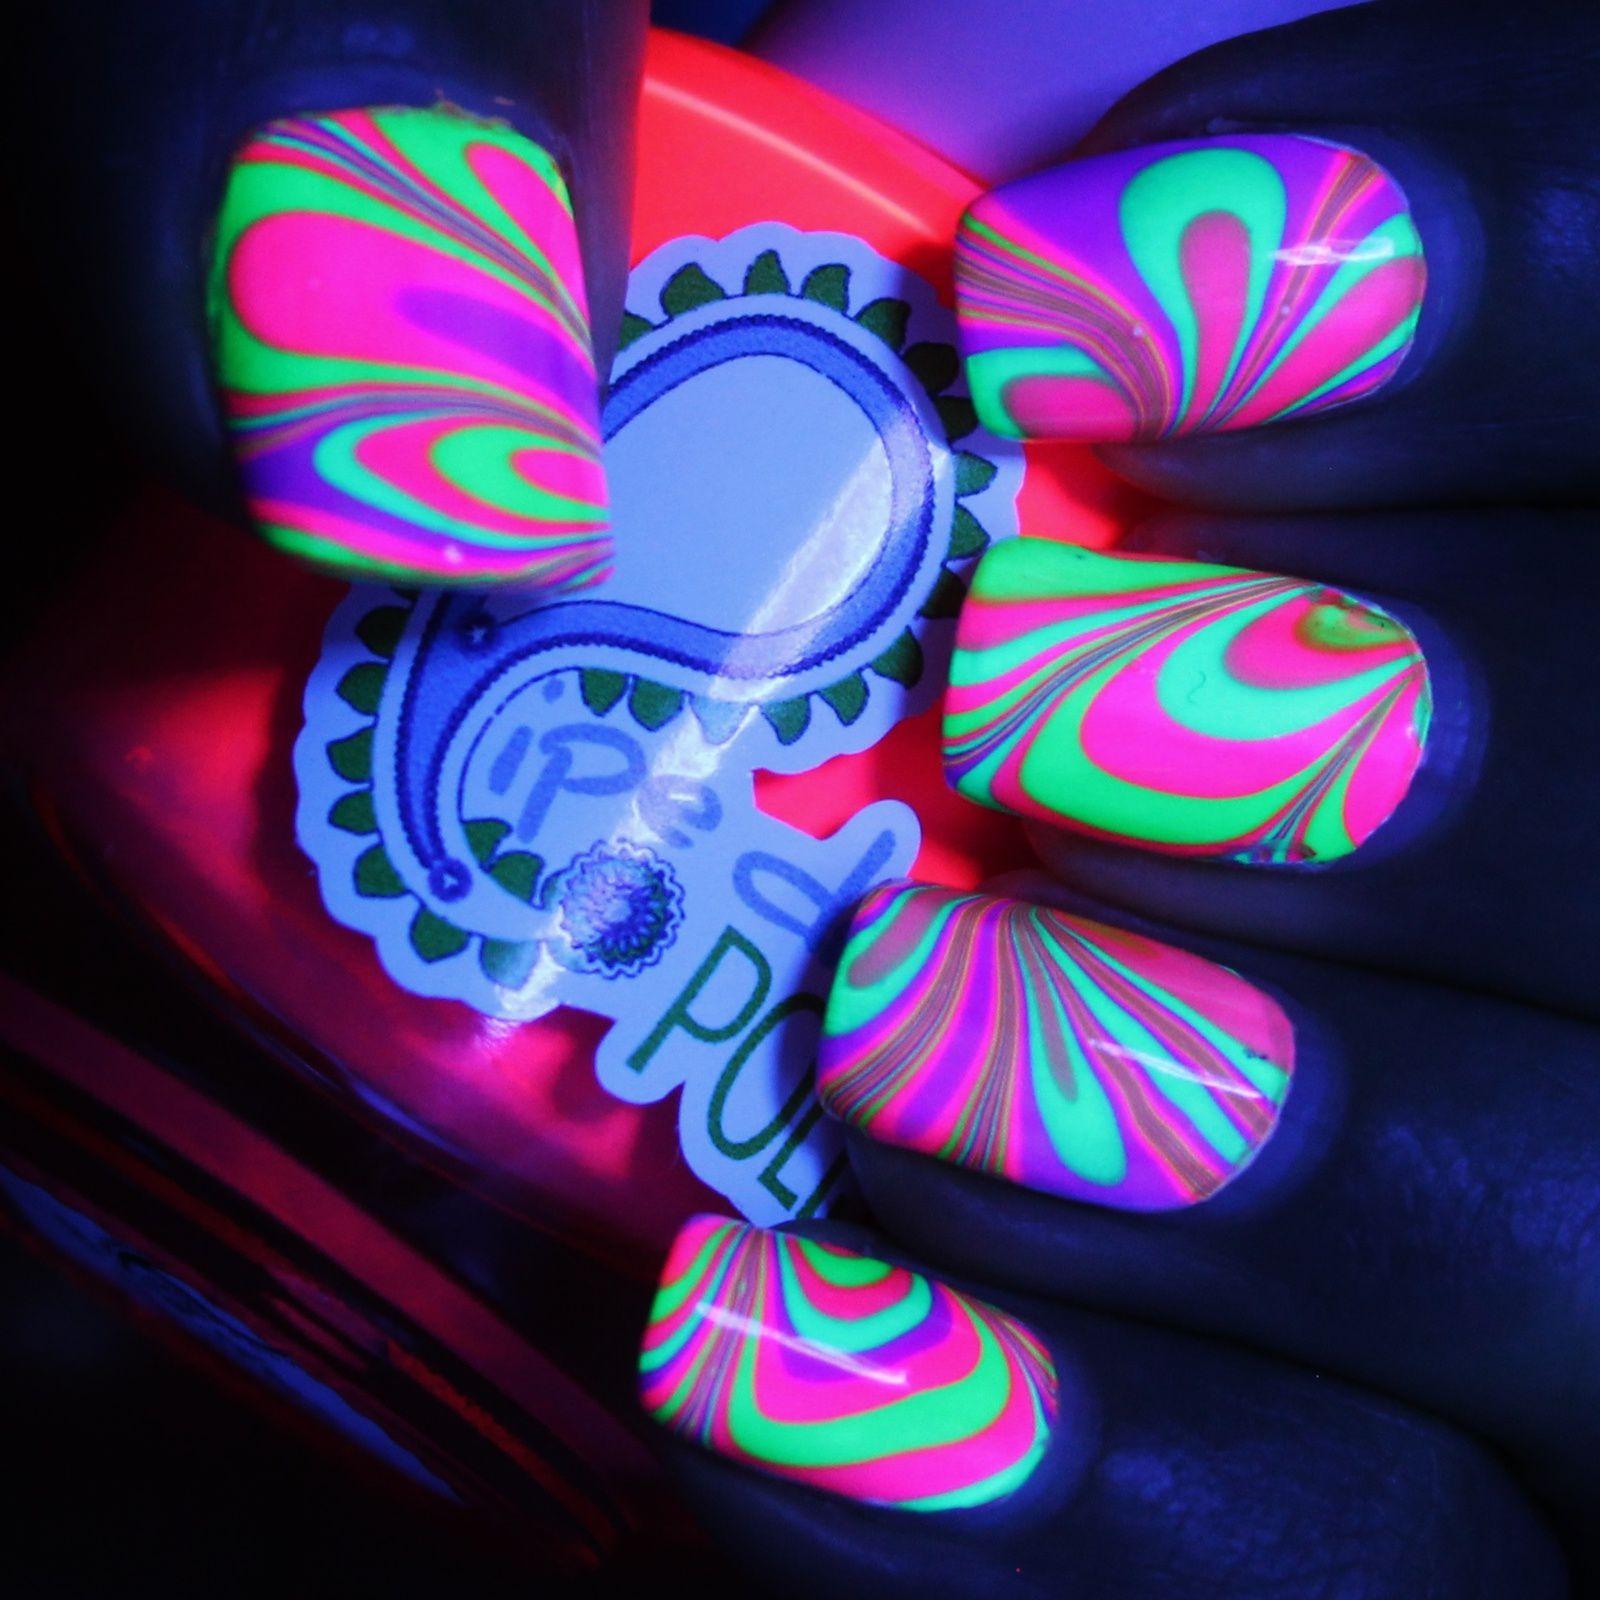 Finger Paints Base Coat for Neons / Pipe Dream Polish Tabanca, VIP Pass, On The List, Masquerader & High Roller / HK Girl Top Coat